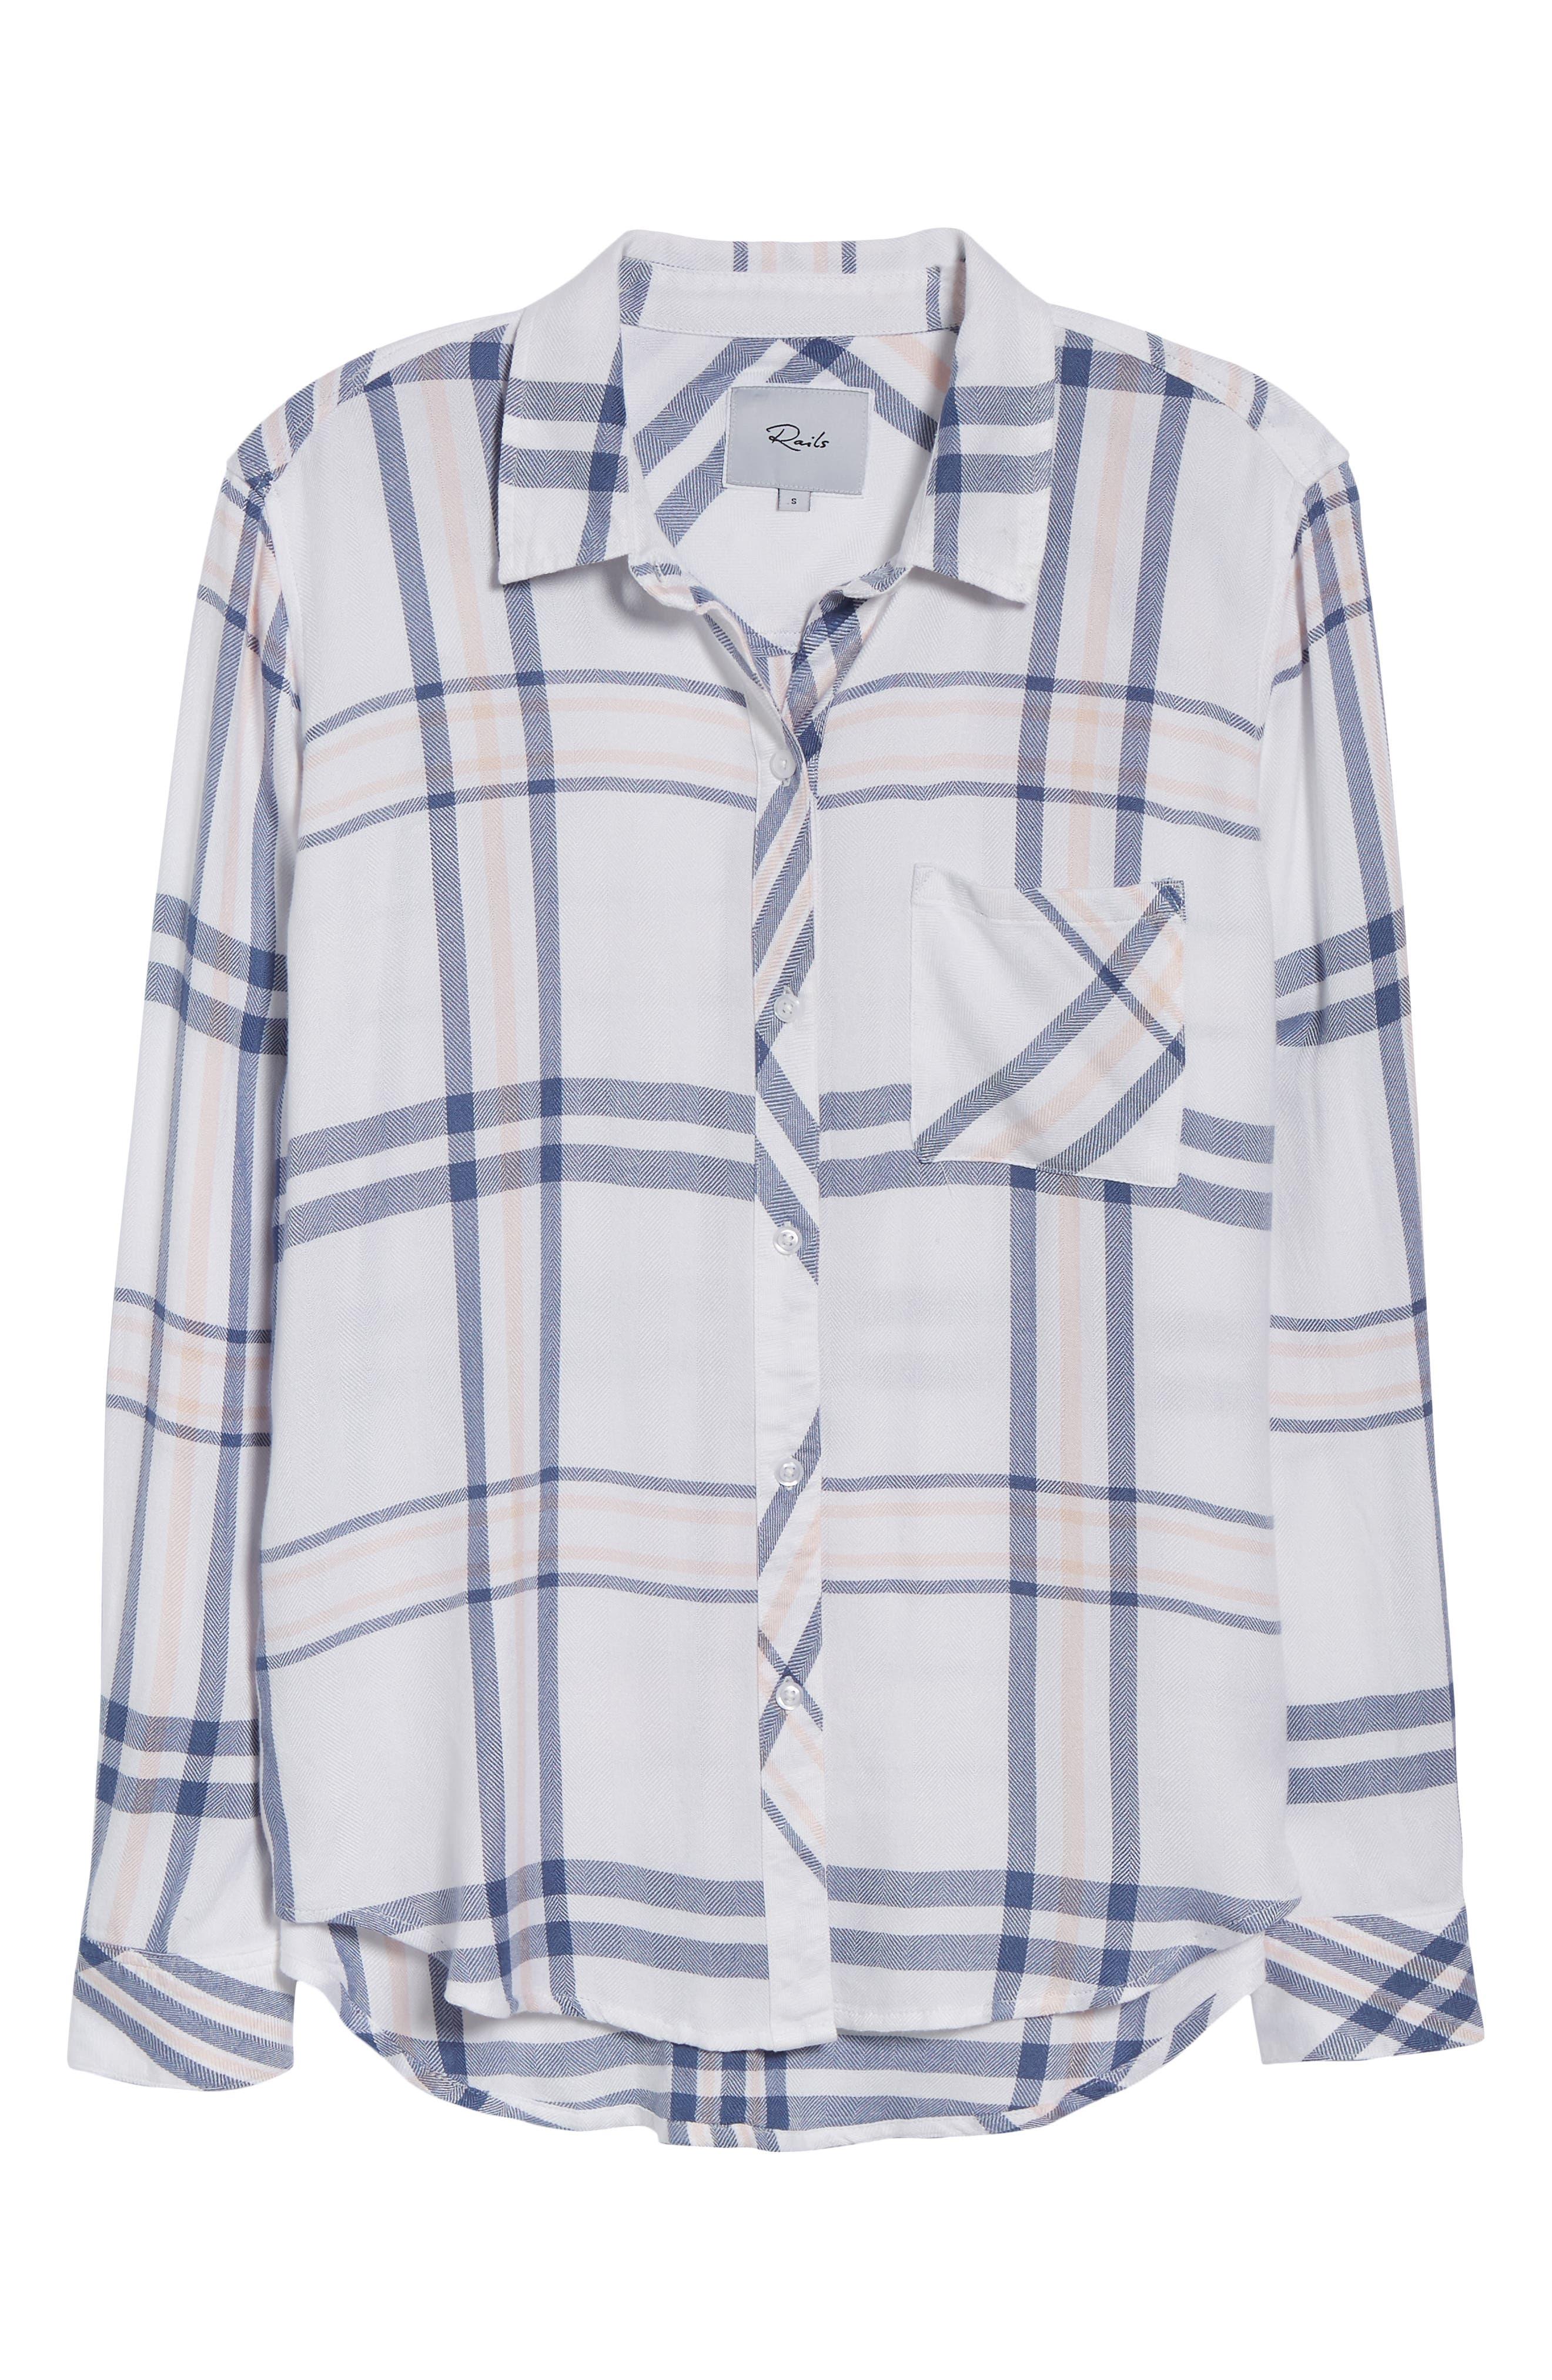 Hunter Plaid Shirt,                             Alternate thumbnail 7, color,                             INDIGO POWDER BLUSH